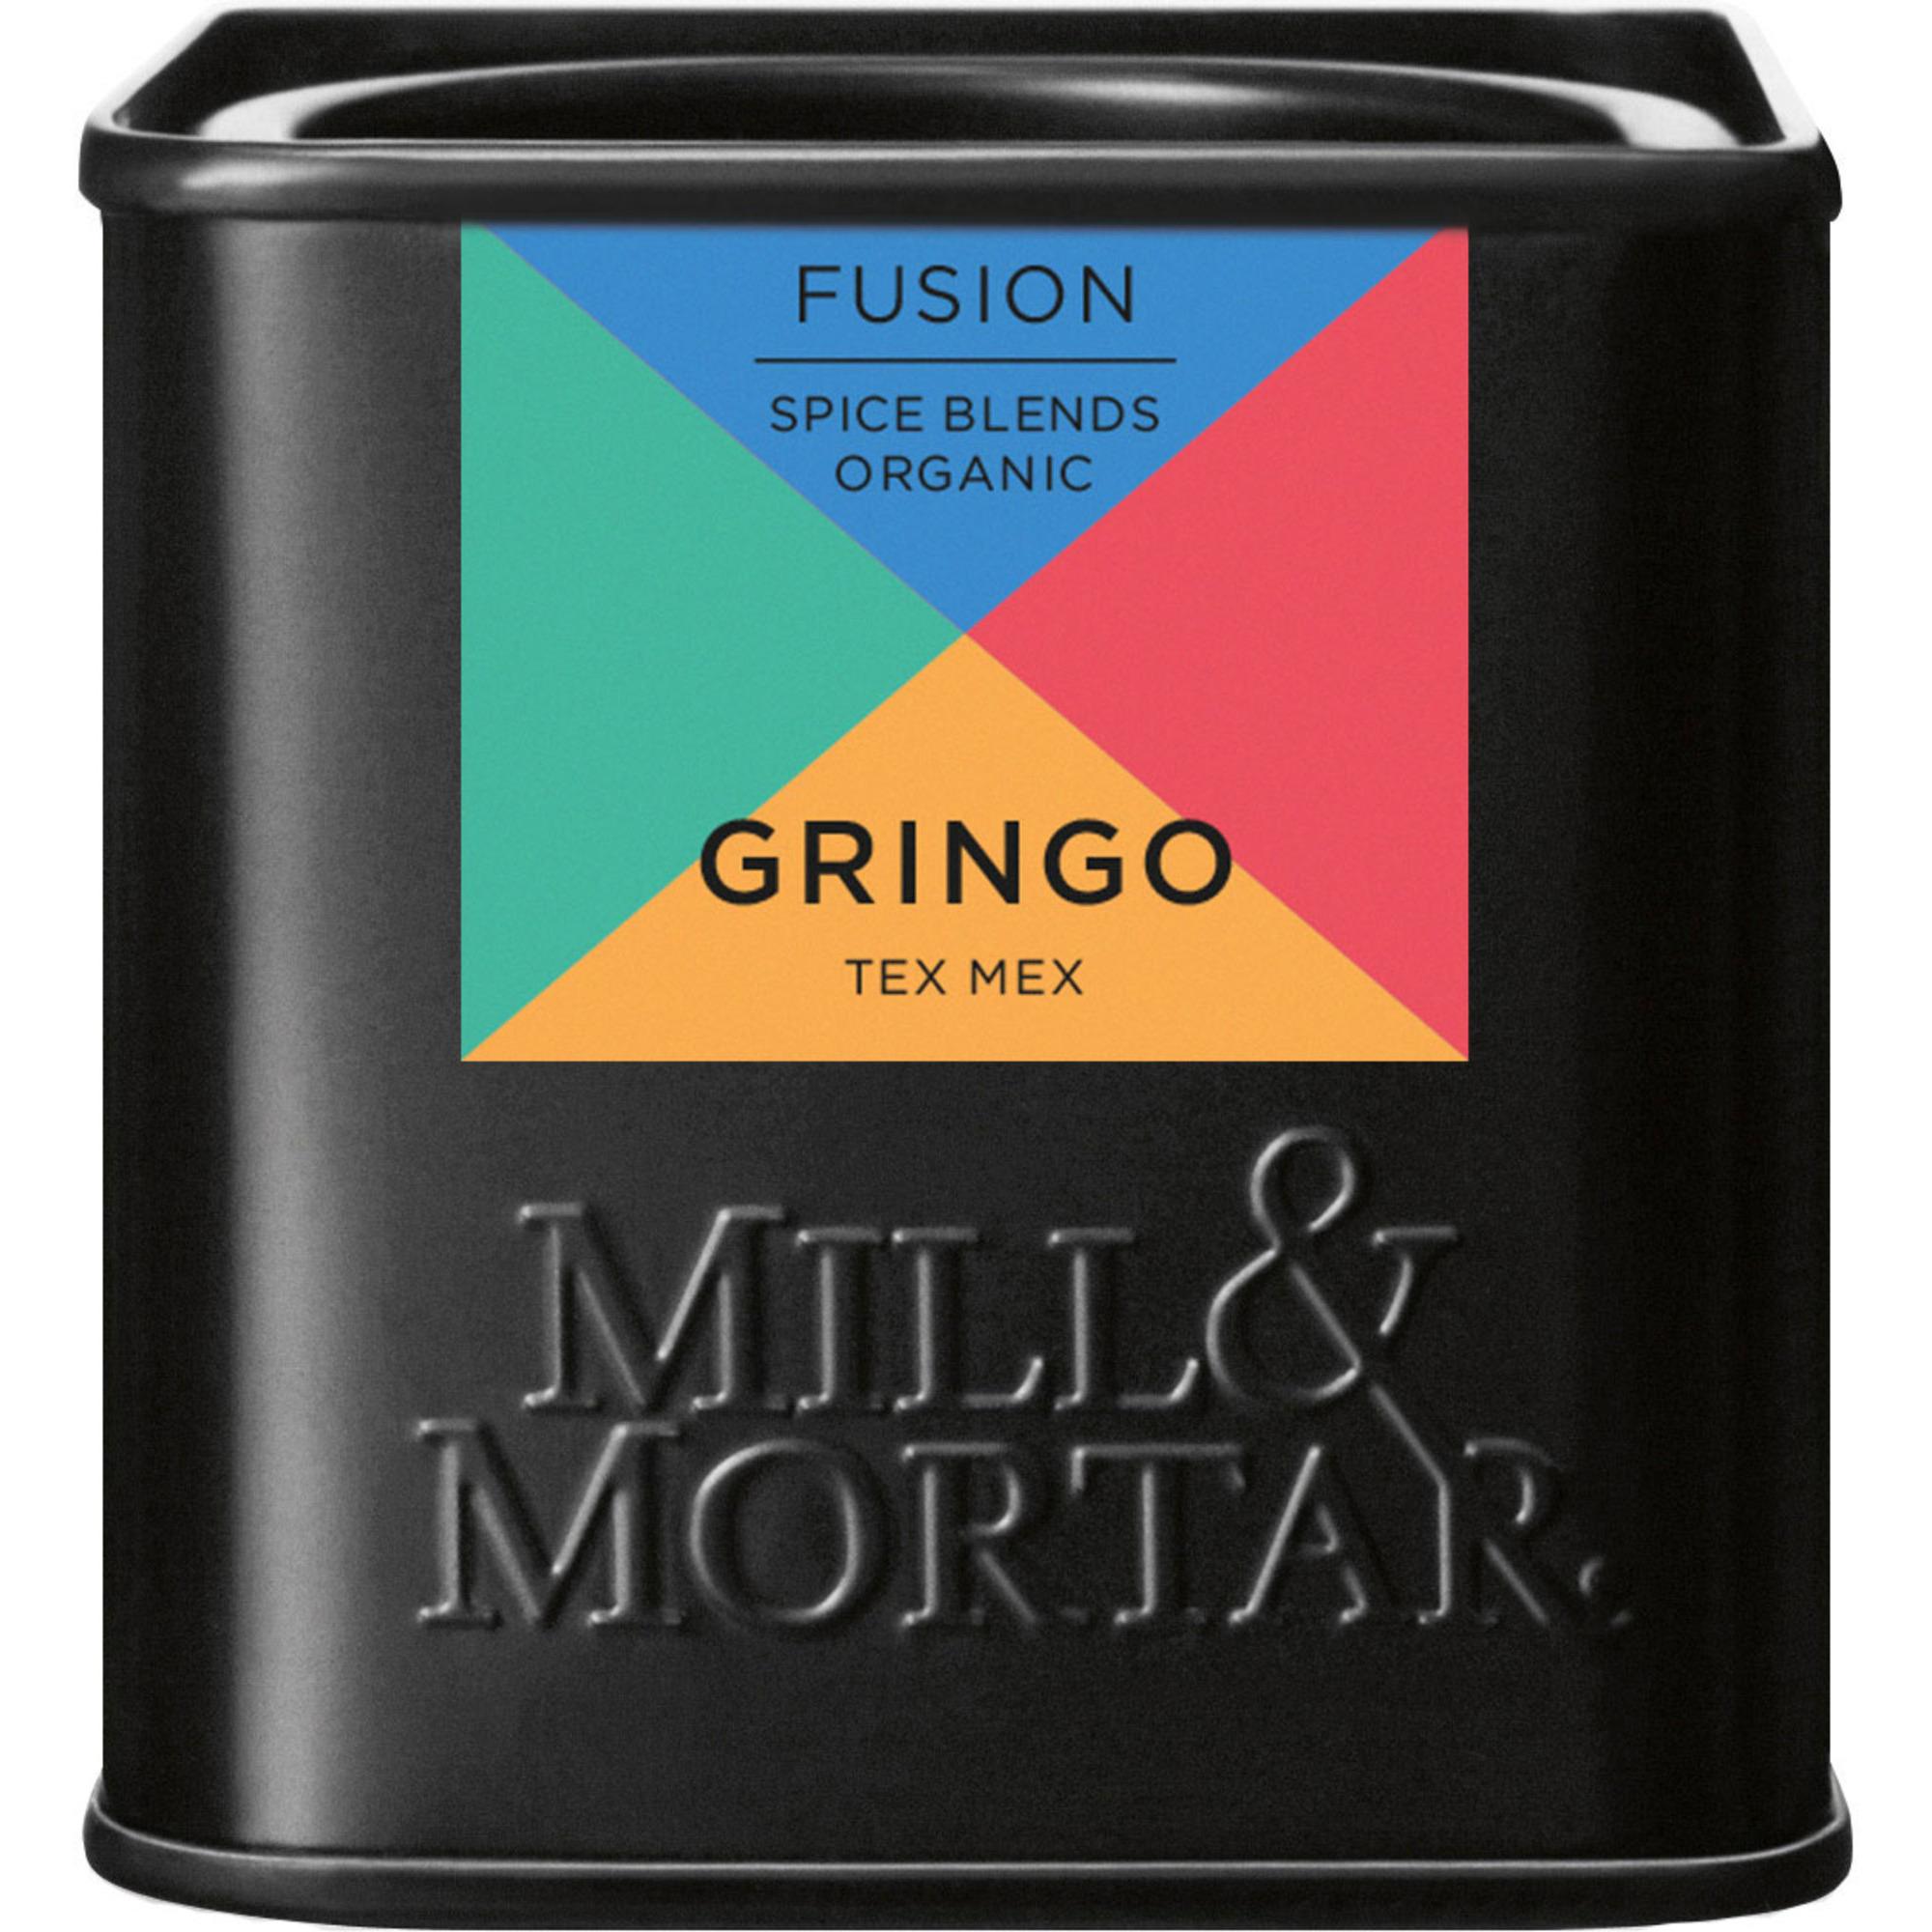 Mill & Mortar Ekologisk Gringo tex mex